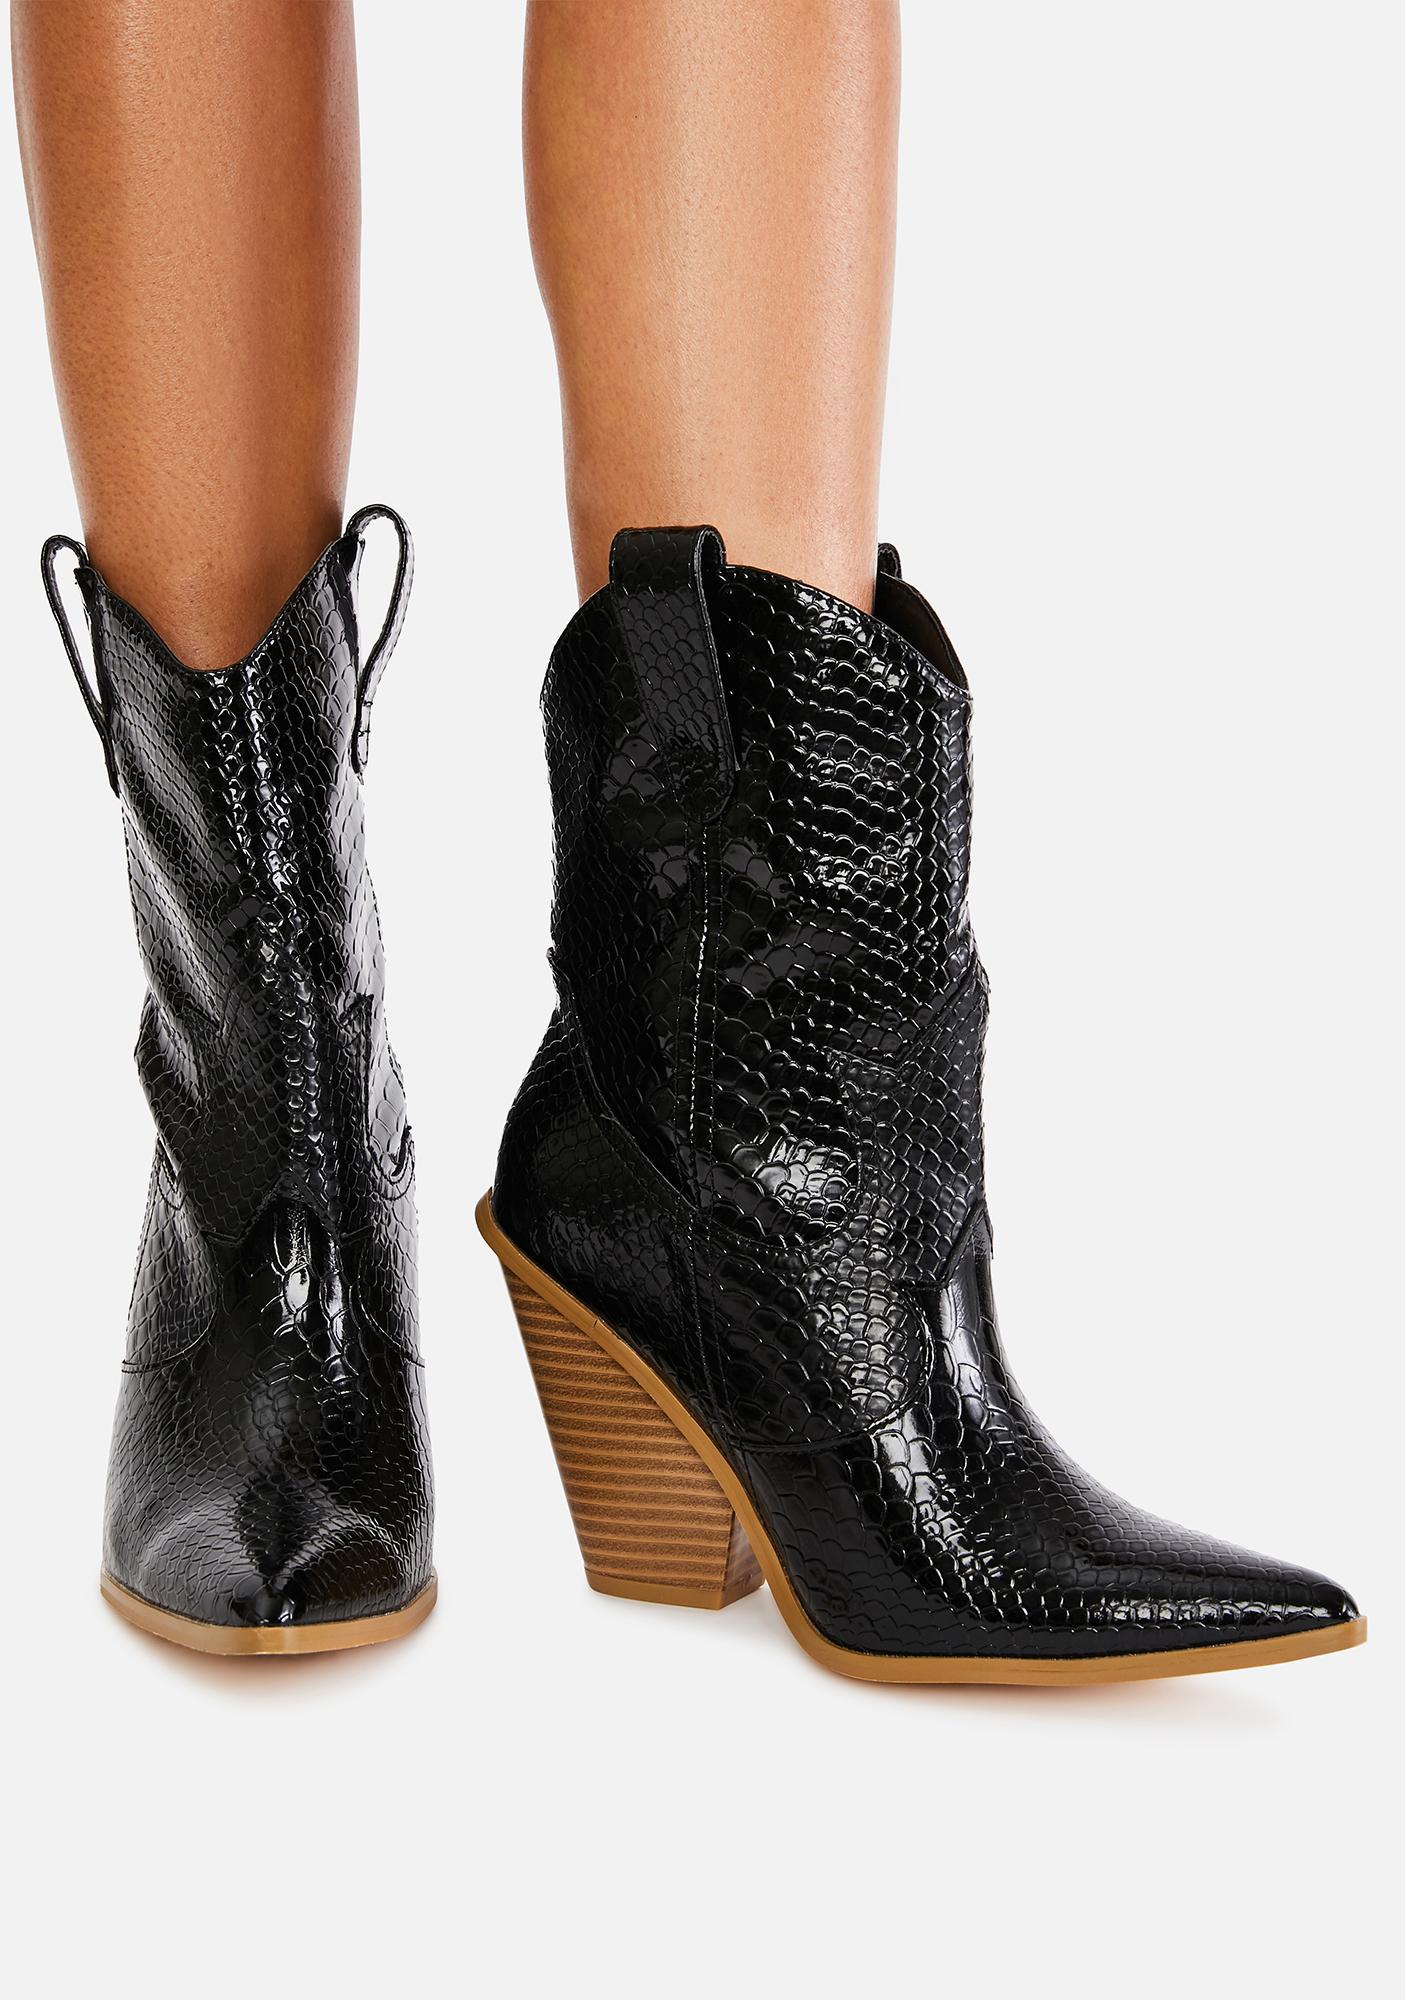 Walk My Way Cowboy Boots